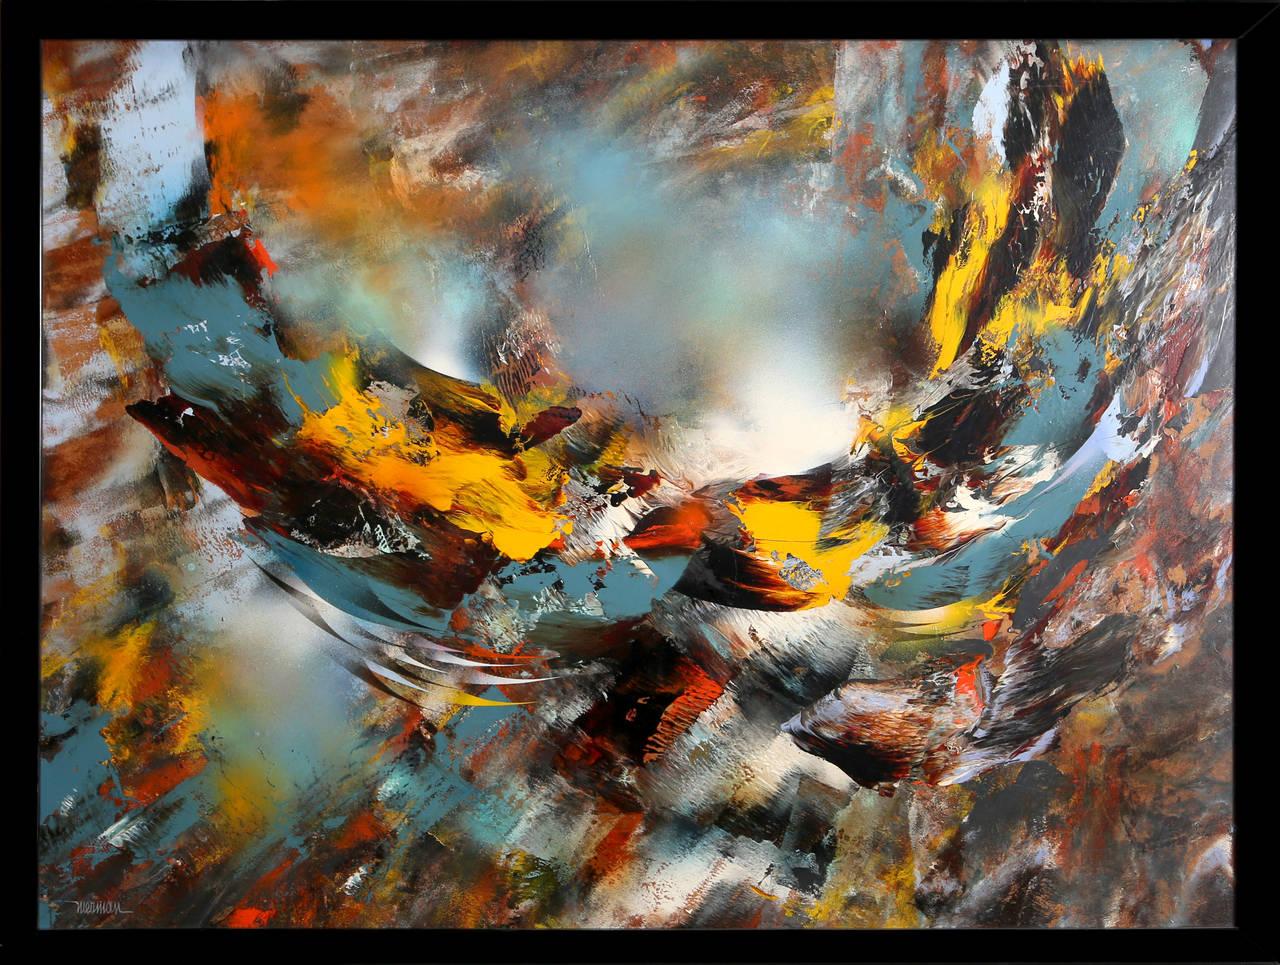 Viento de Otono (Autumn Wind), Abstract Painting by Leonardo Nierman